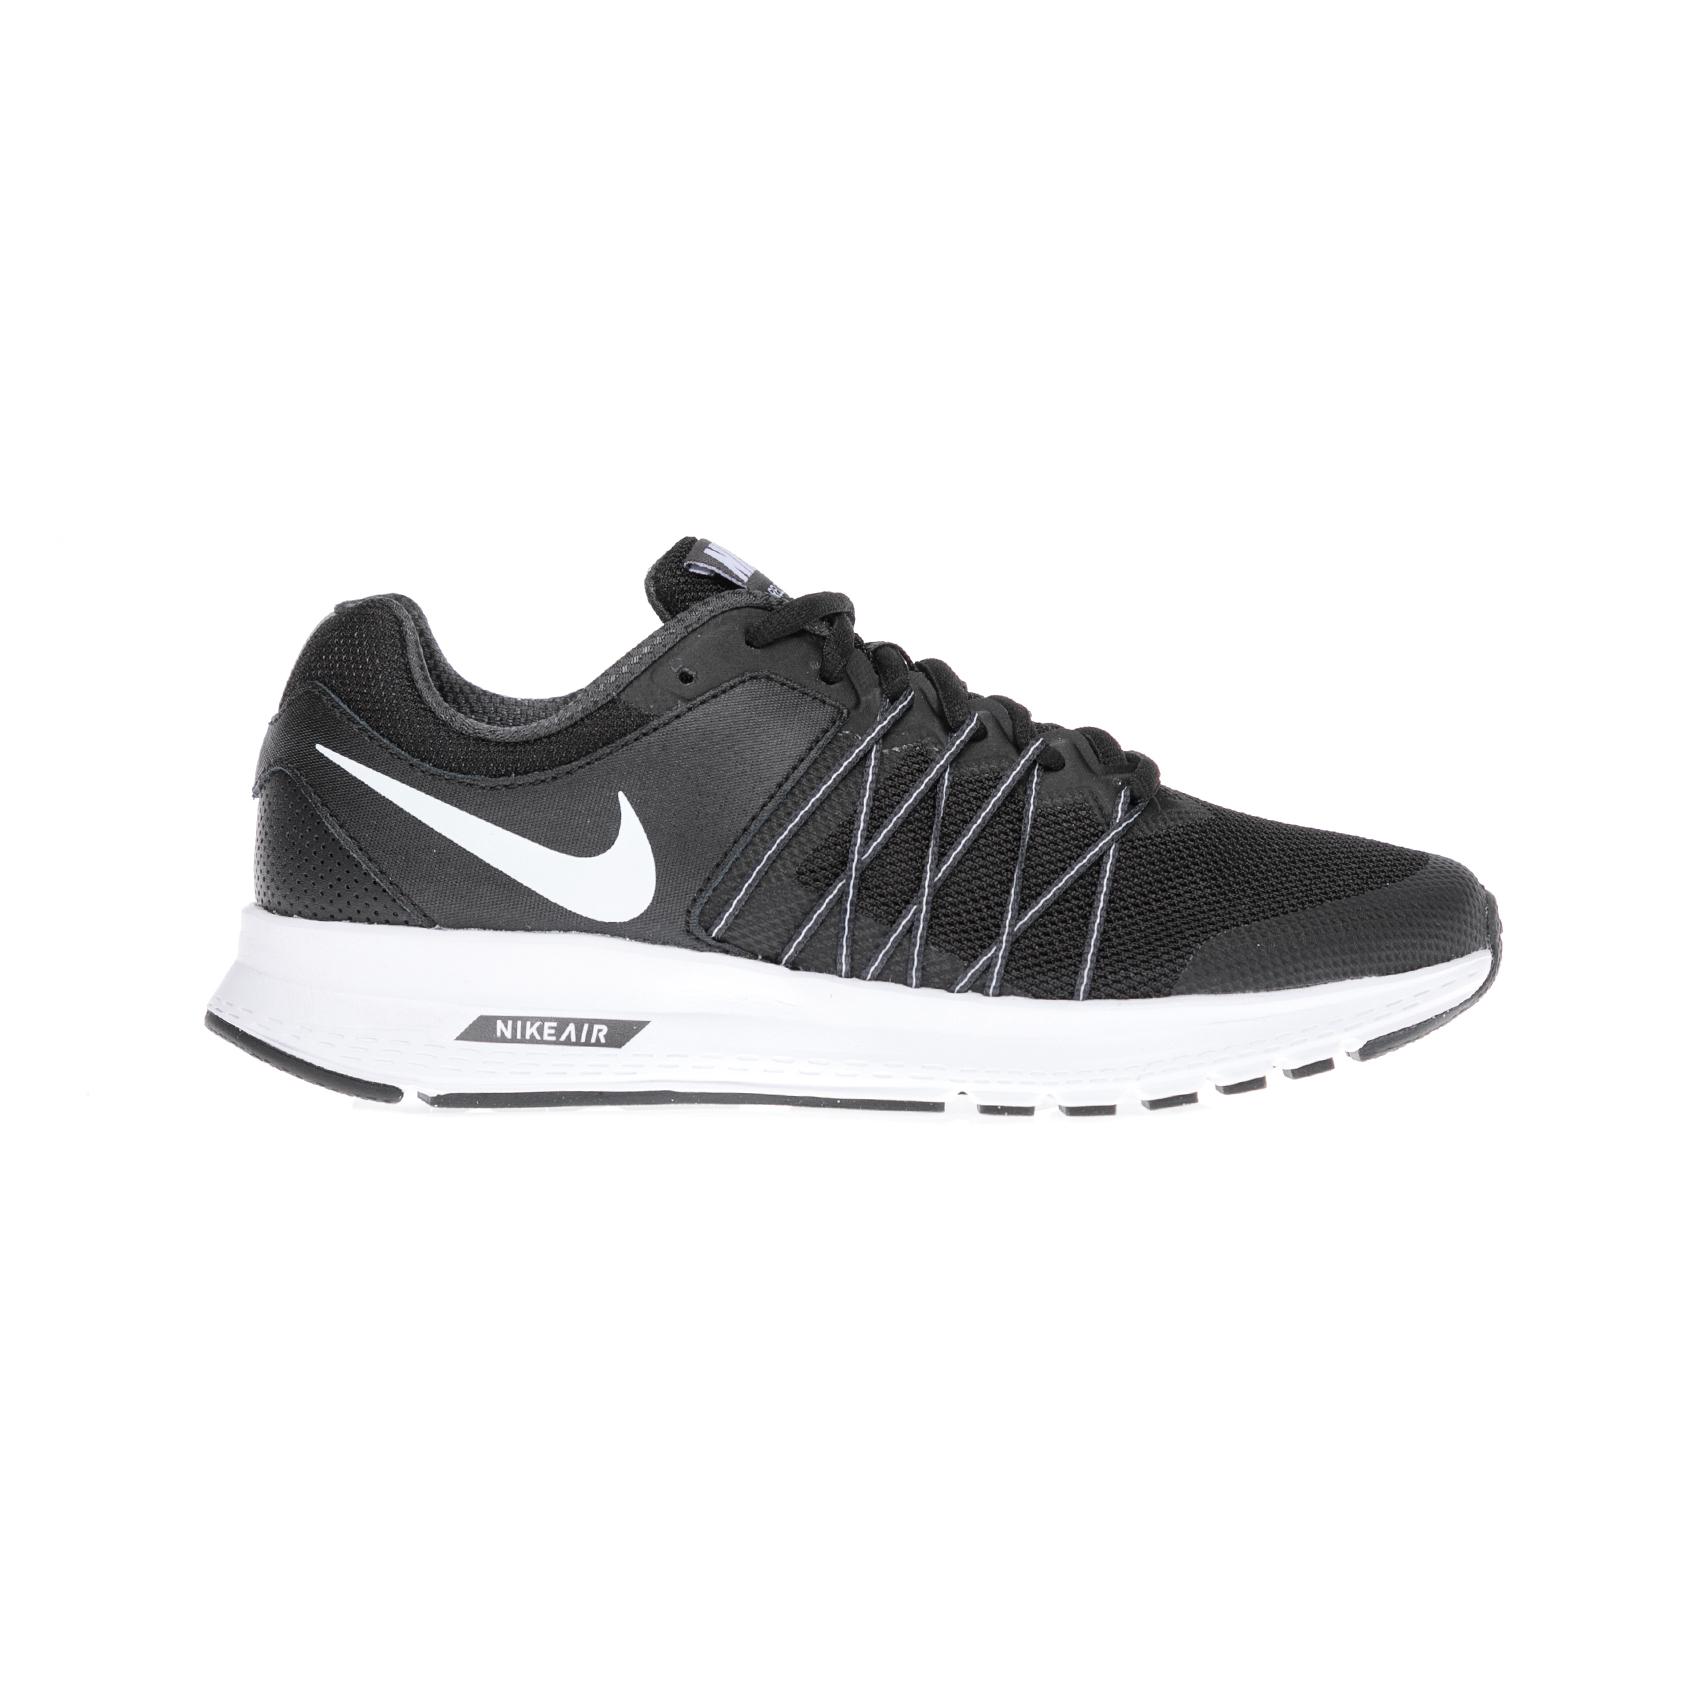 NIKE – Γυναικεία αθλητικά παπούτσια NIKE AIR RELENTLESS 6 μαύρα